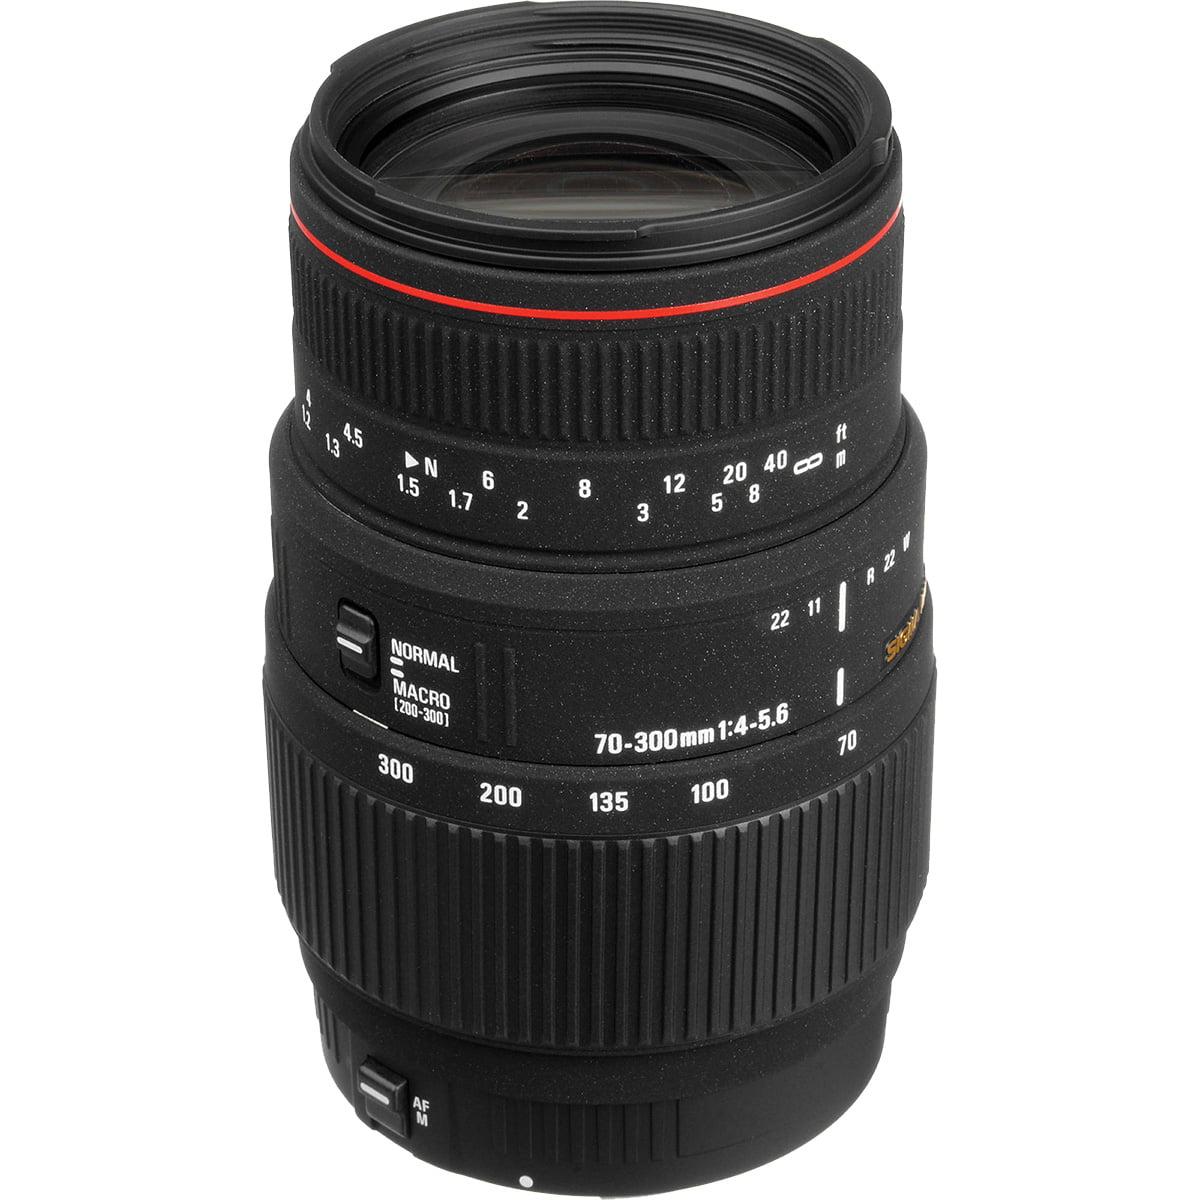 Sigma 70-300mm f/4-5.6 APO DG Motorized Macro Zoom Lens (for Nikon Cameras)